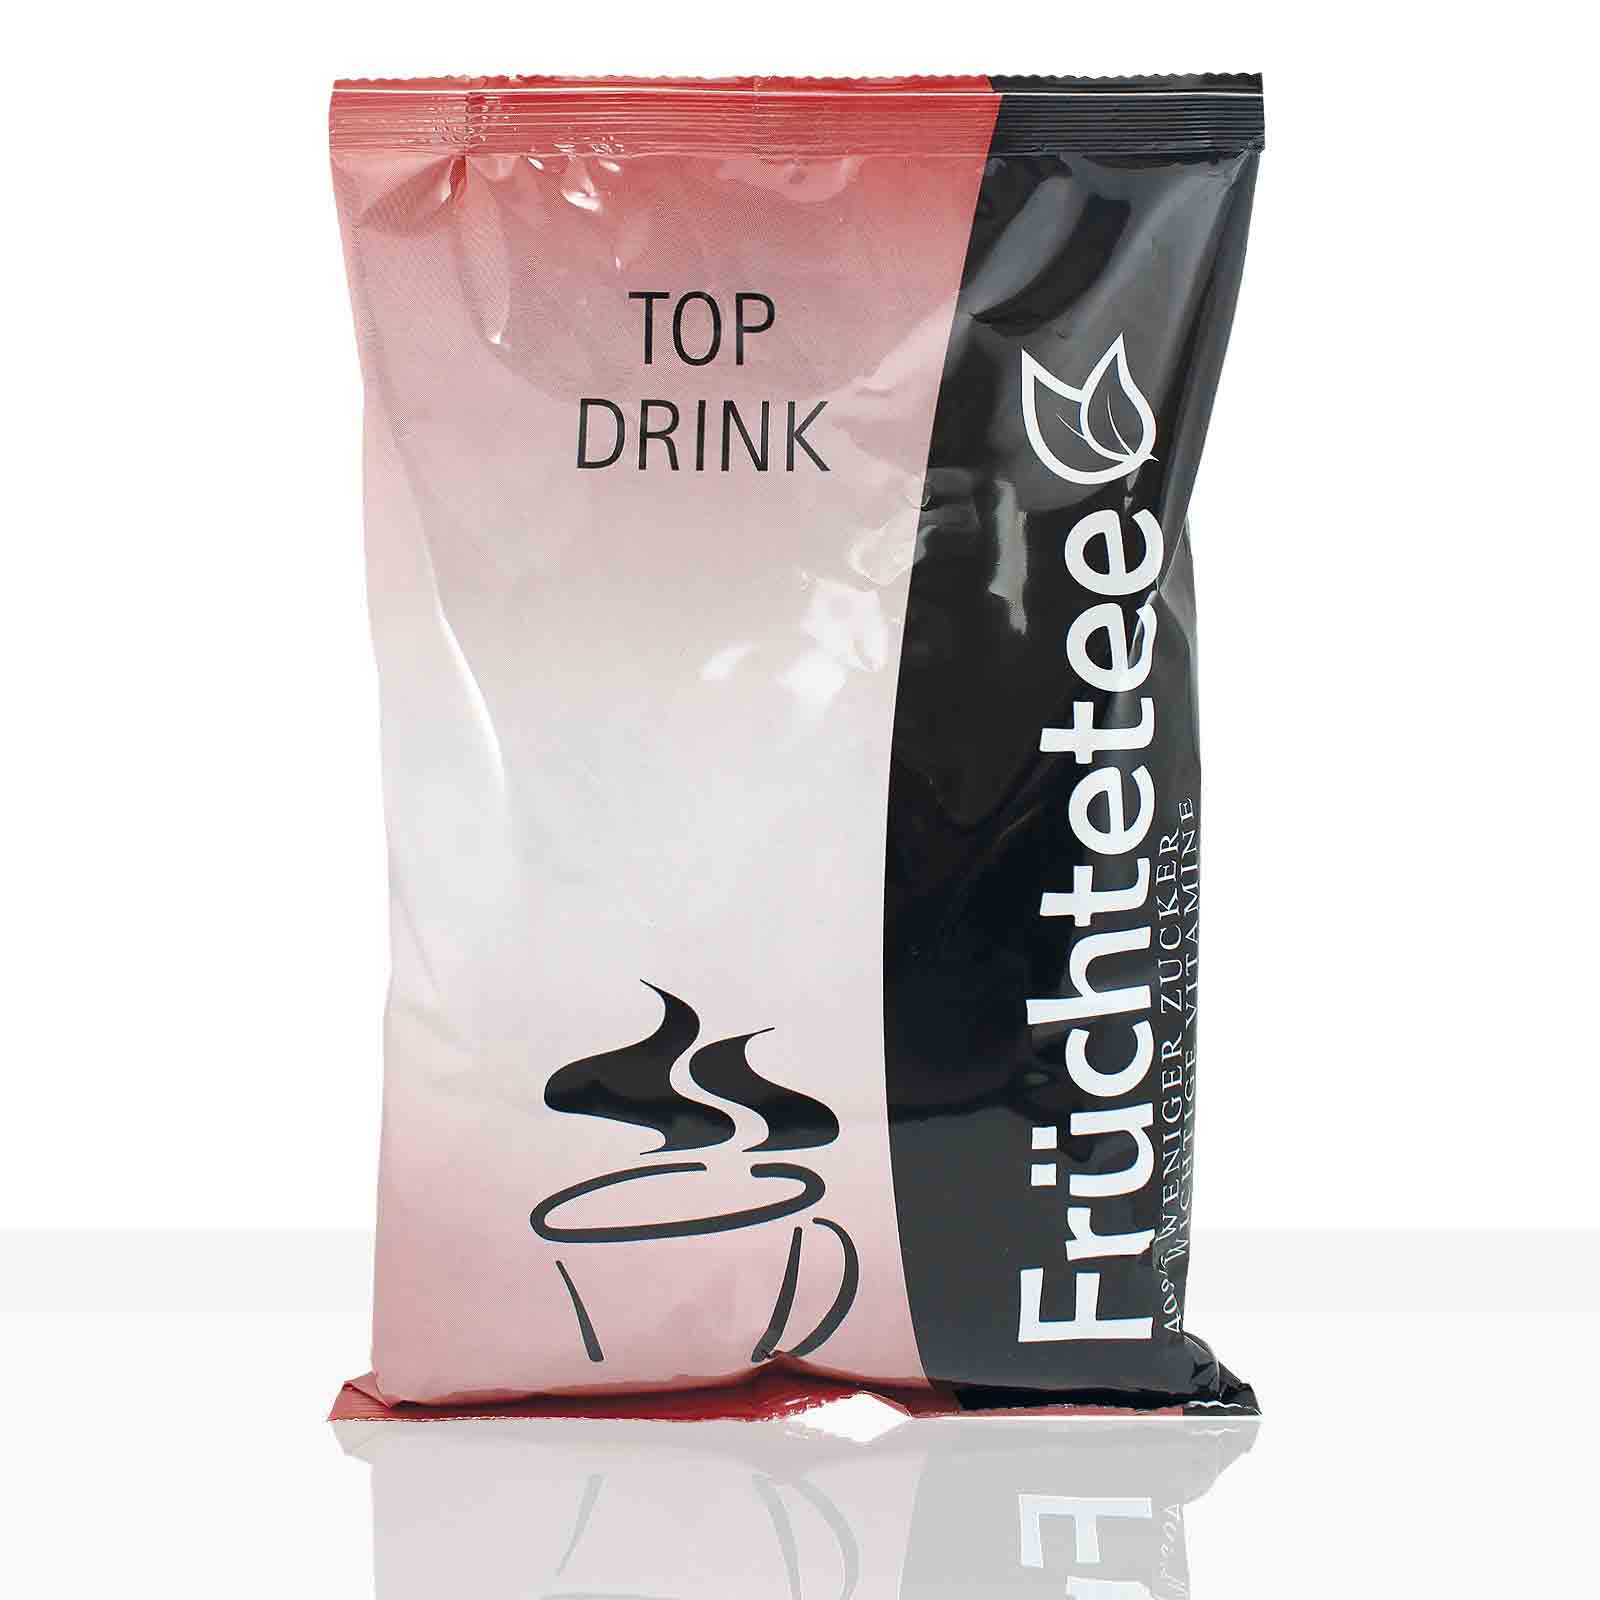 Hämmerle Früchtetee 10 x 1kg, Top Drink Instant-Tee